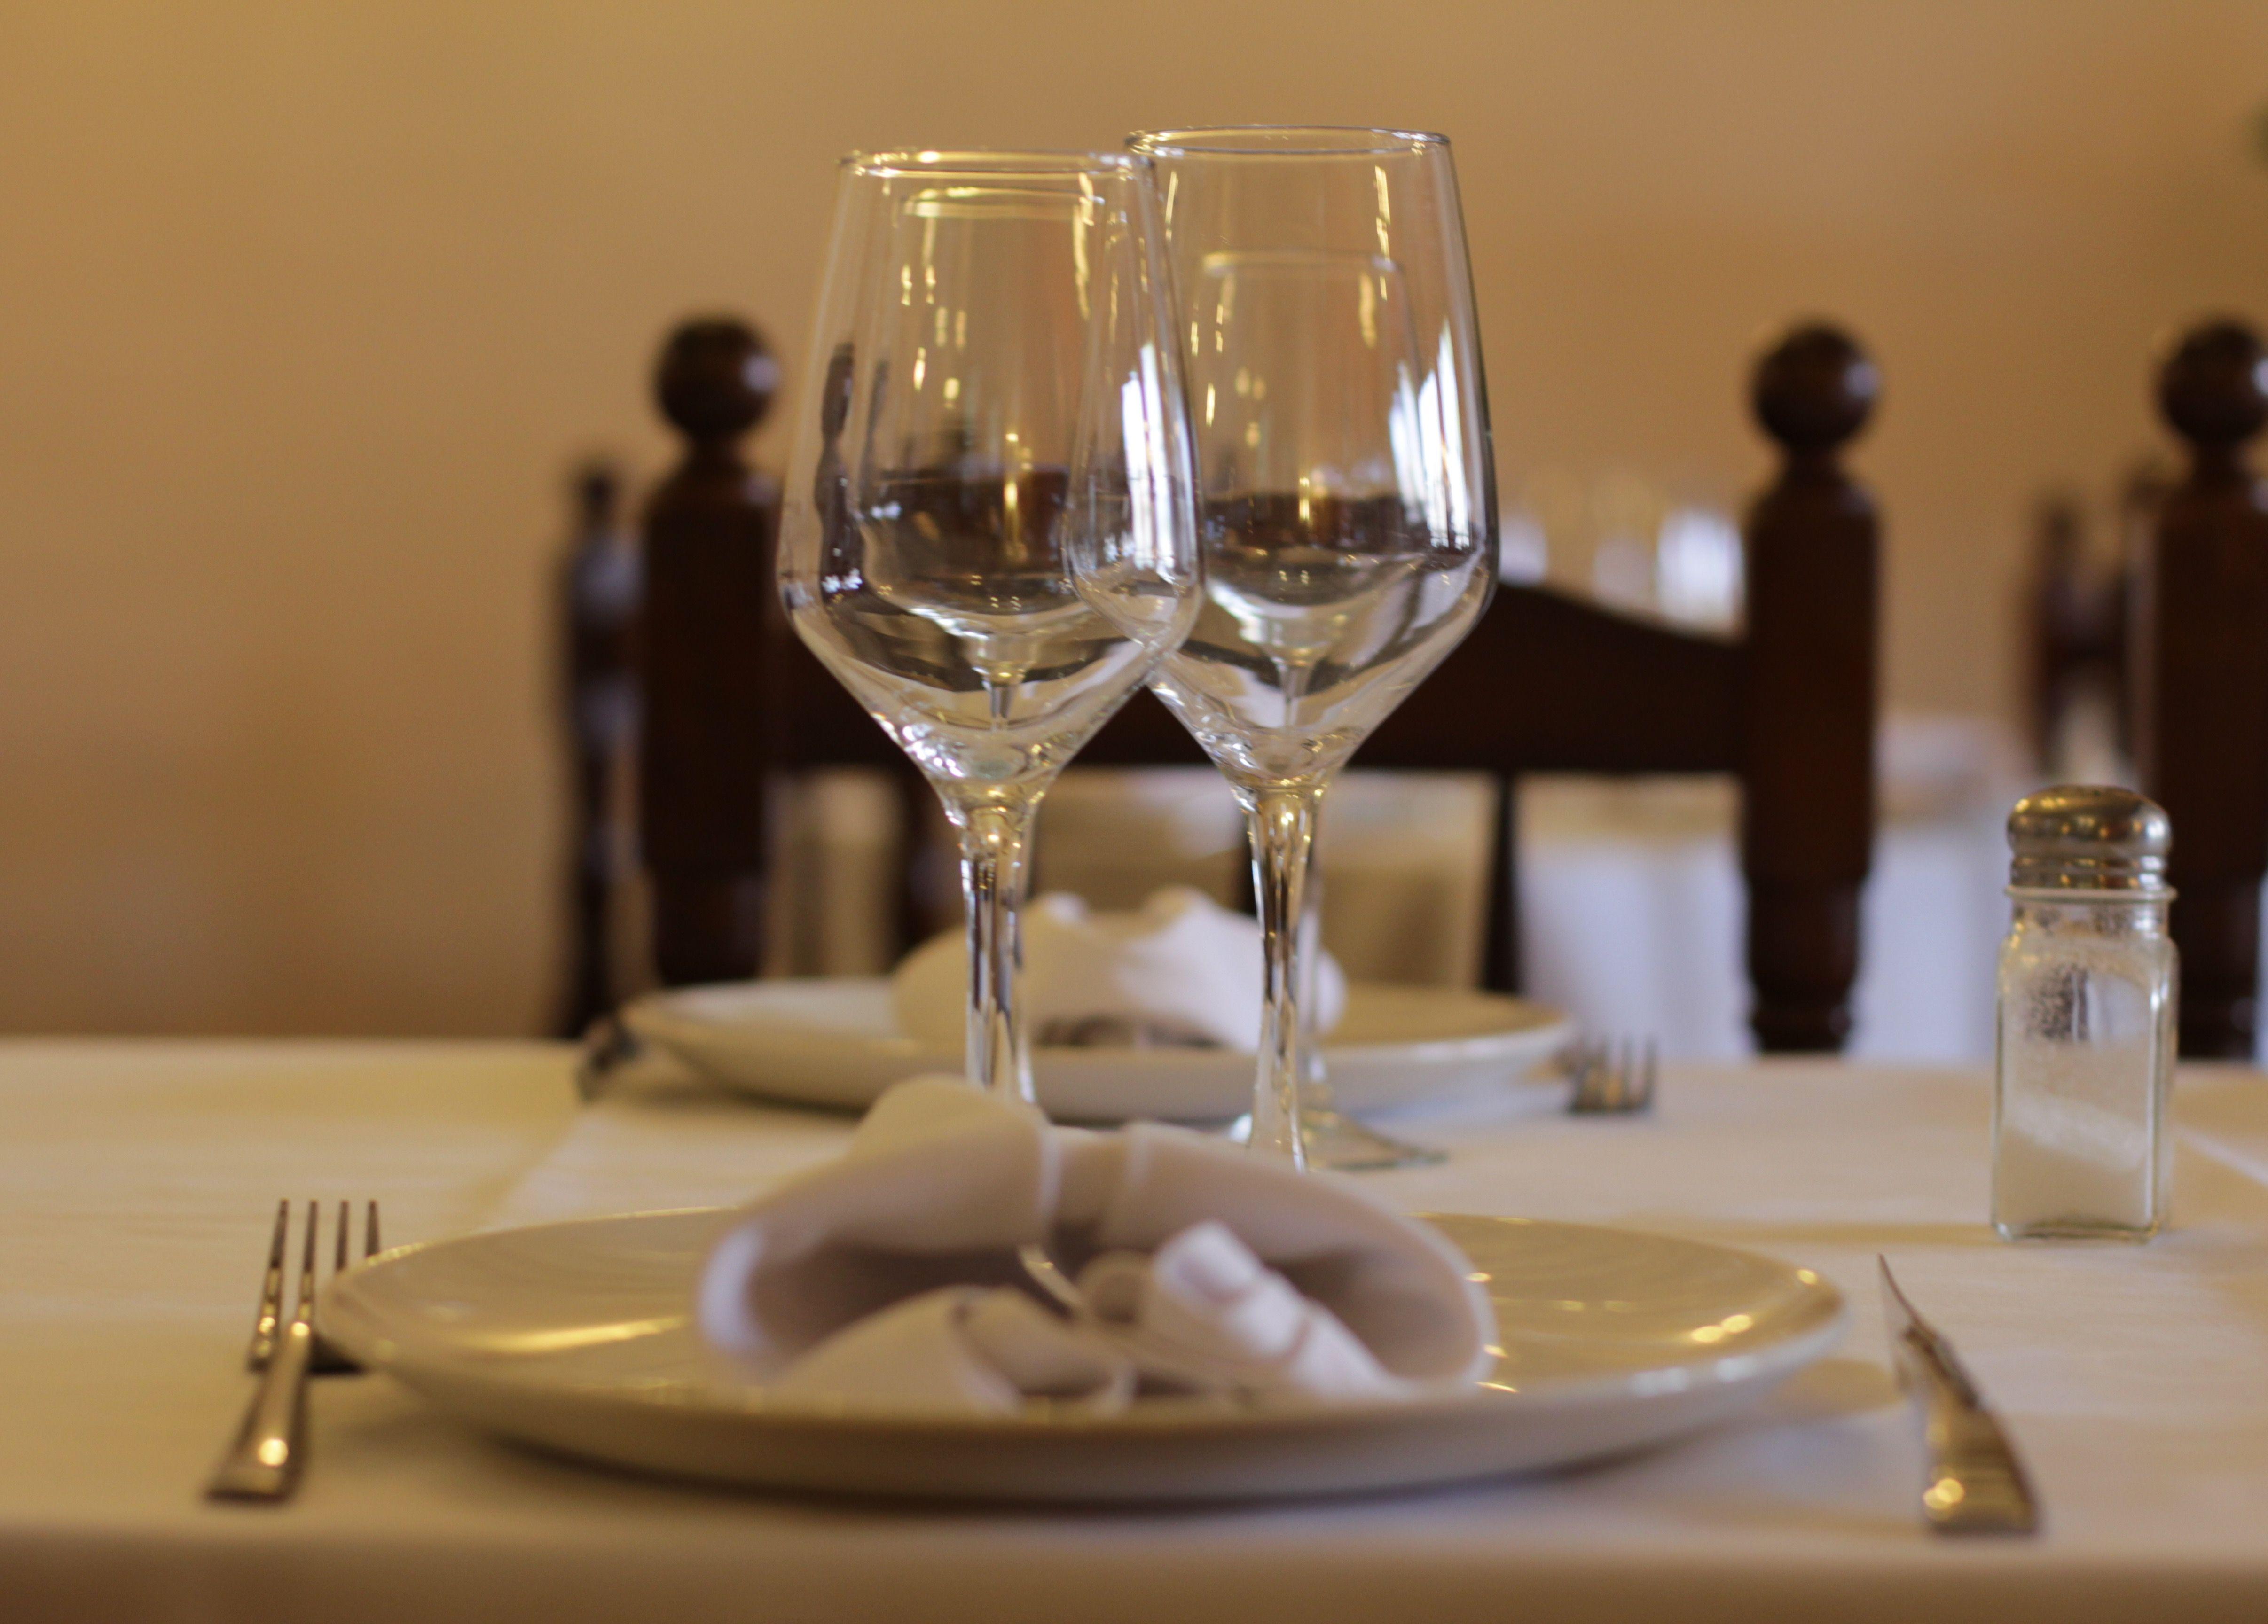 Foto 16 de Mesón - restaurante en Benimantell | Mesón Ca Rafel